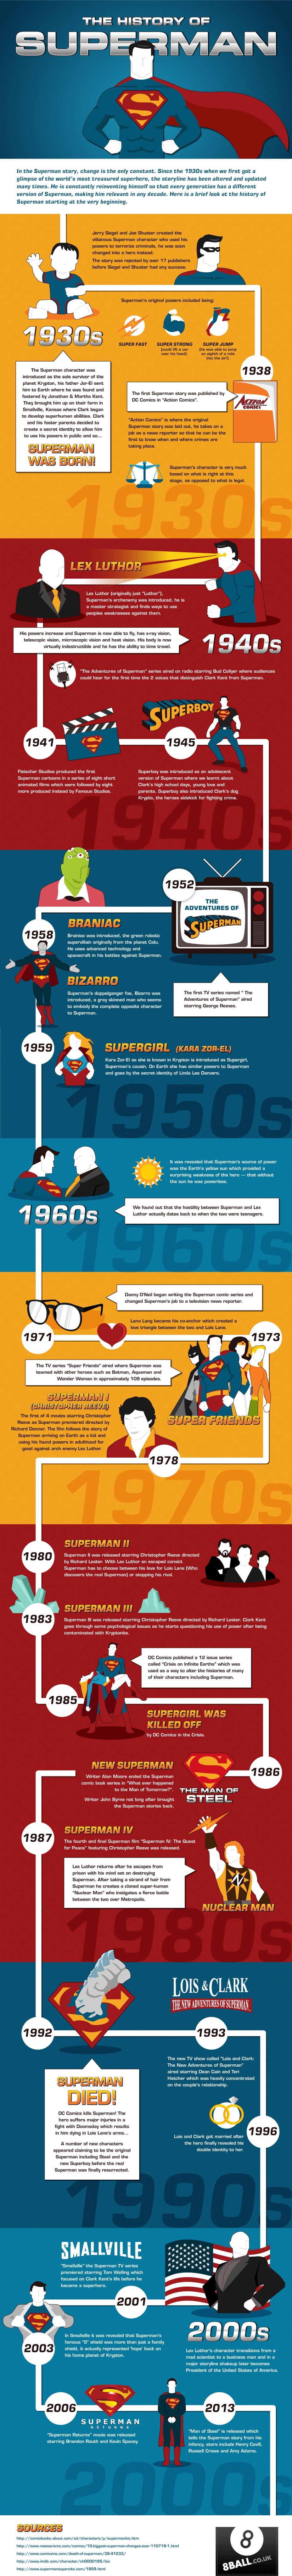 superman_infographic